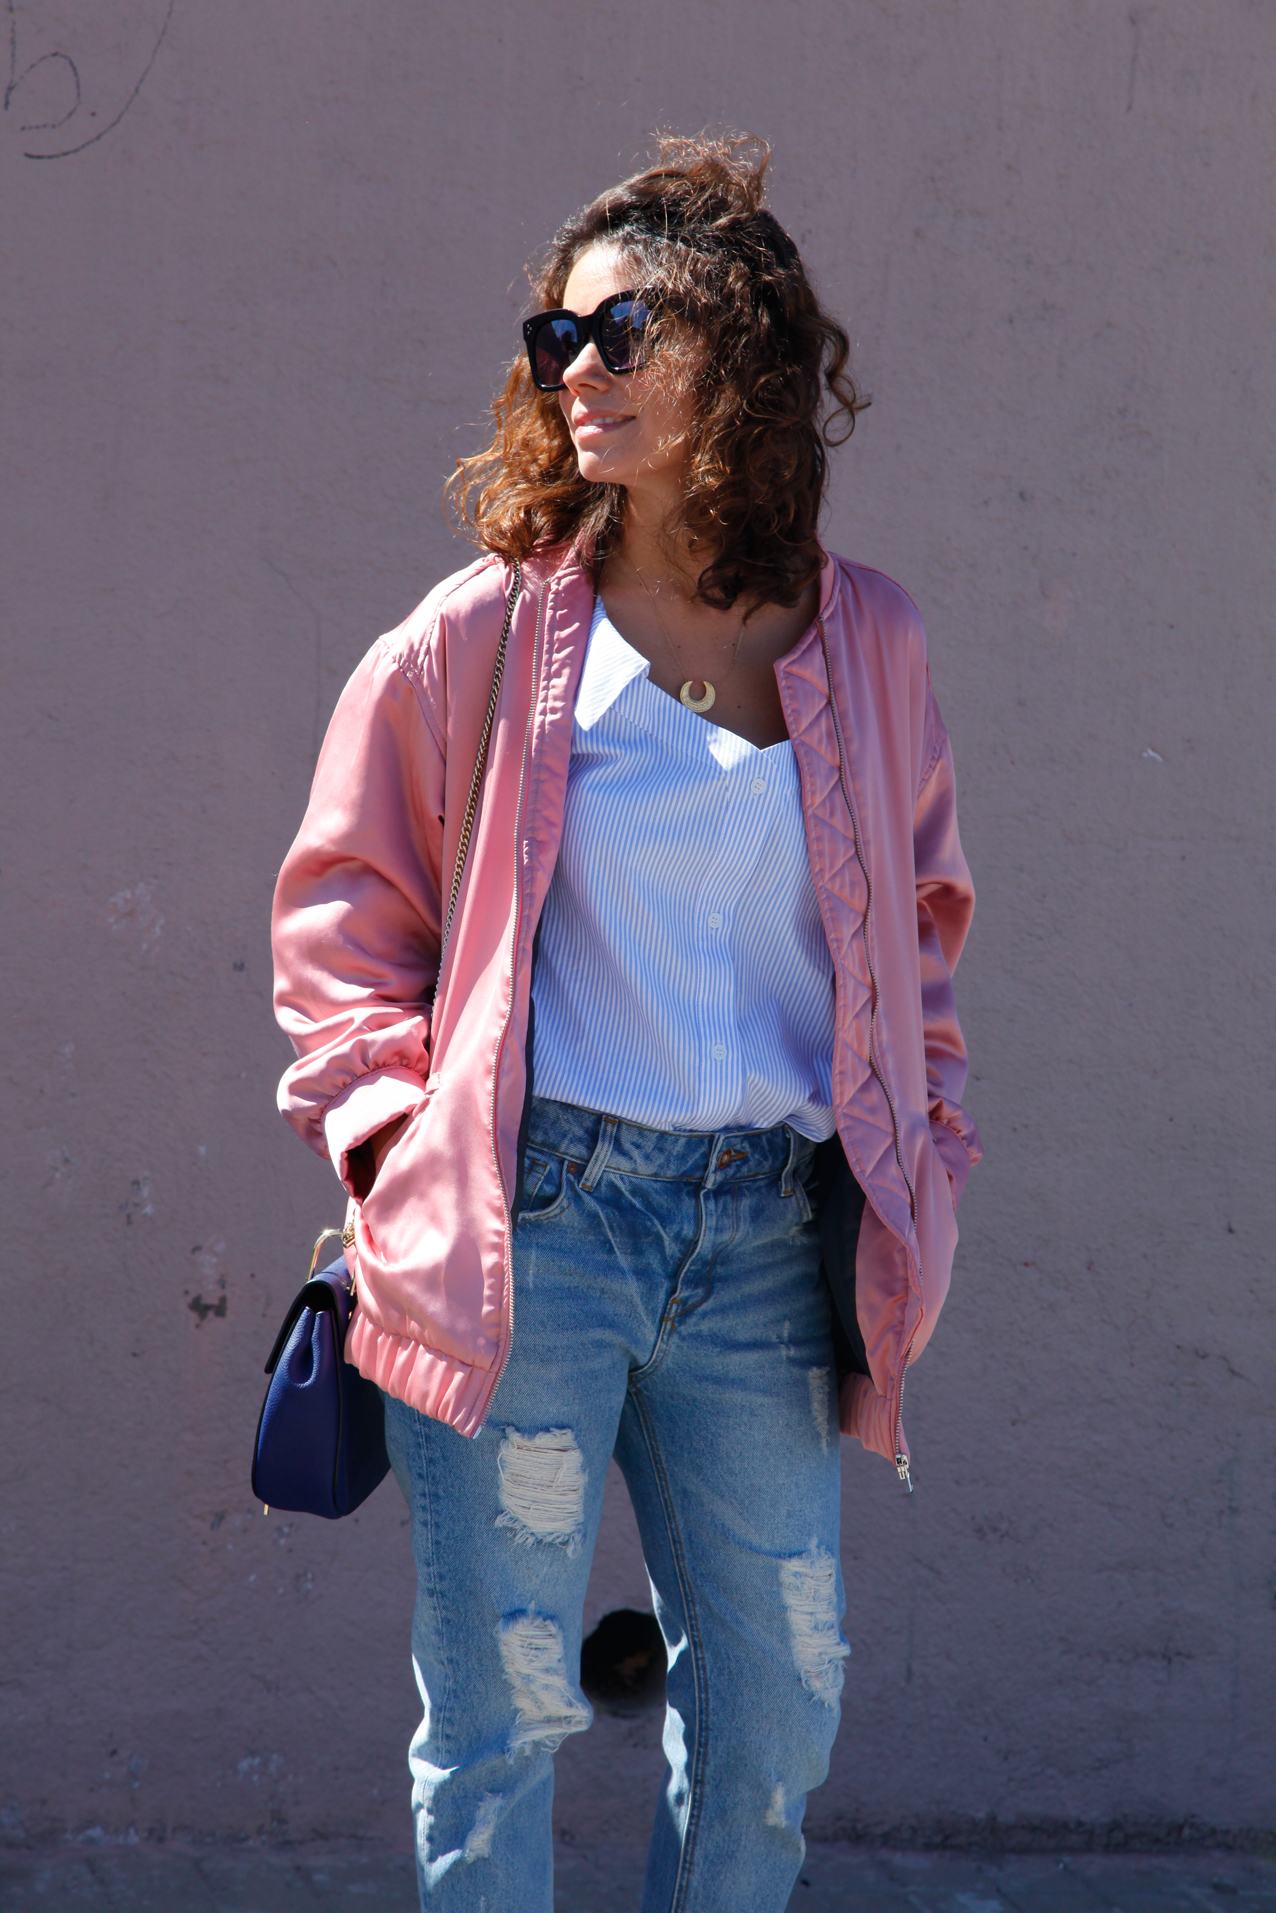 Spring-look-shoulder-off_shirt_espardrilles_streetstyle-cool_lemonade-bomber